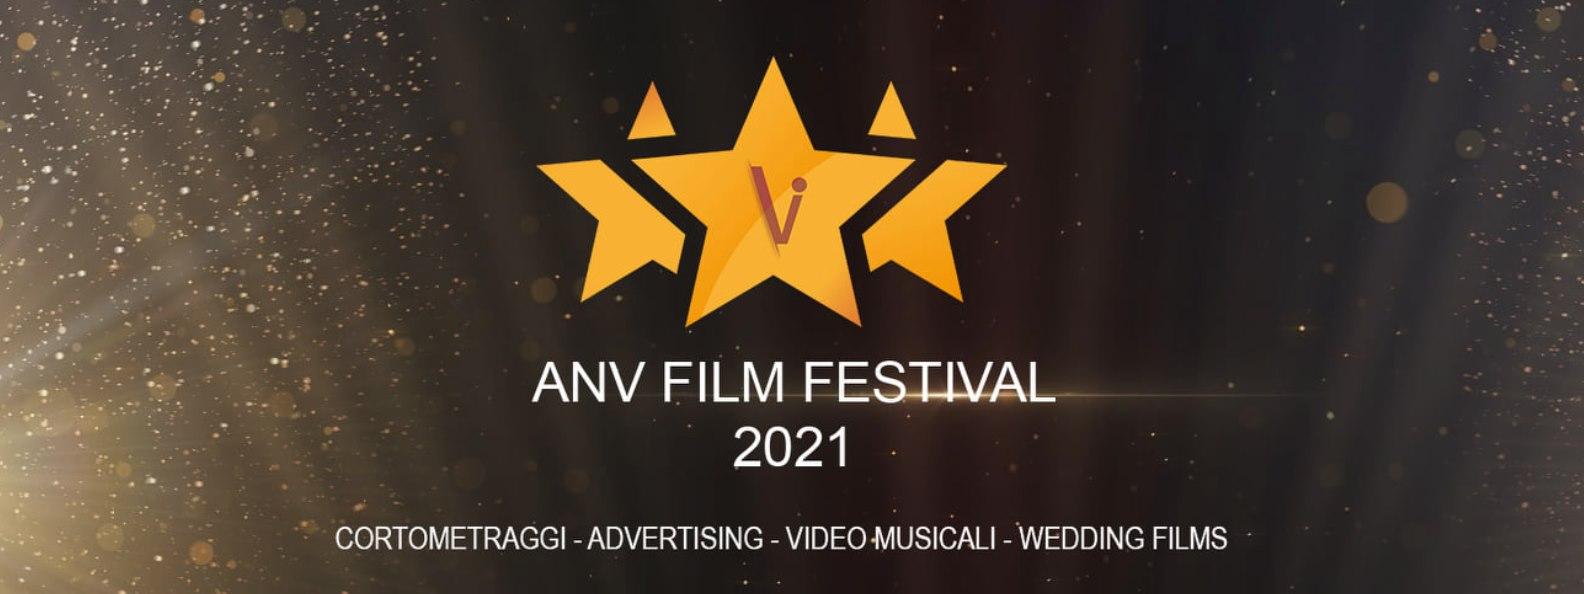 LVDUMV a ANV Film Festival 2021